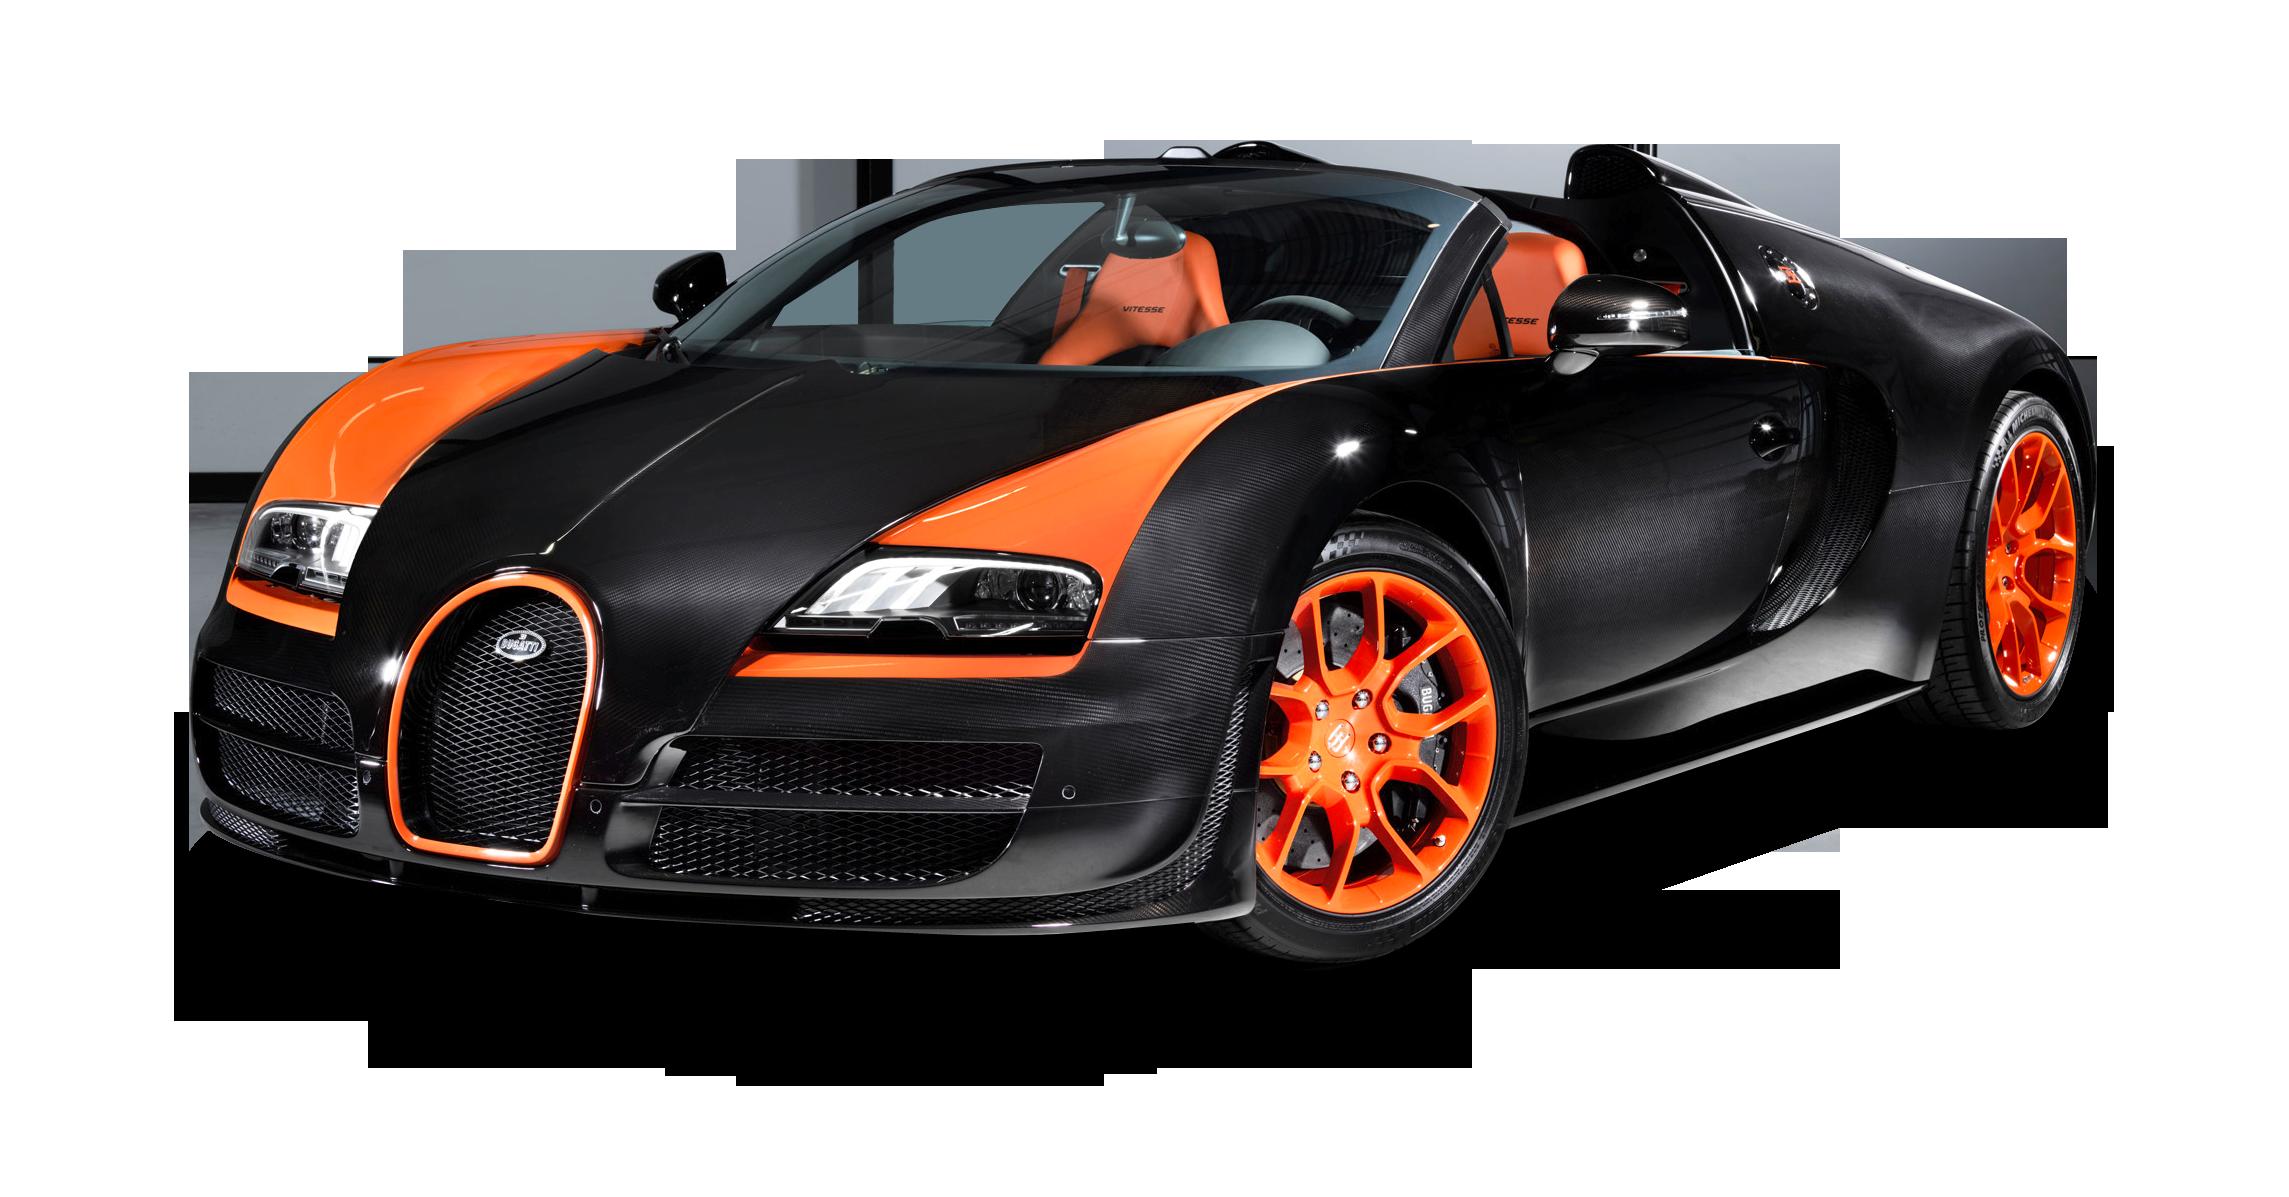 187ce38c788e26e1f59f7f657e043149 Interesting Bugatti Veyron Grand Sport Vitesse Vs Pagani Huayra Cars Trend